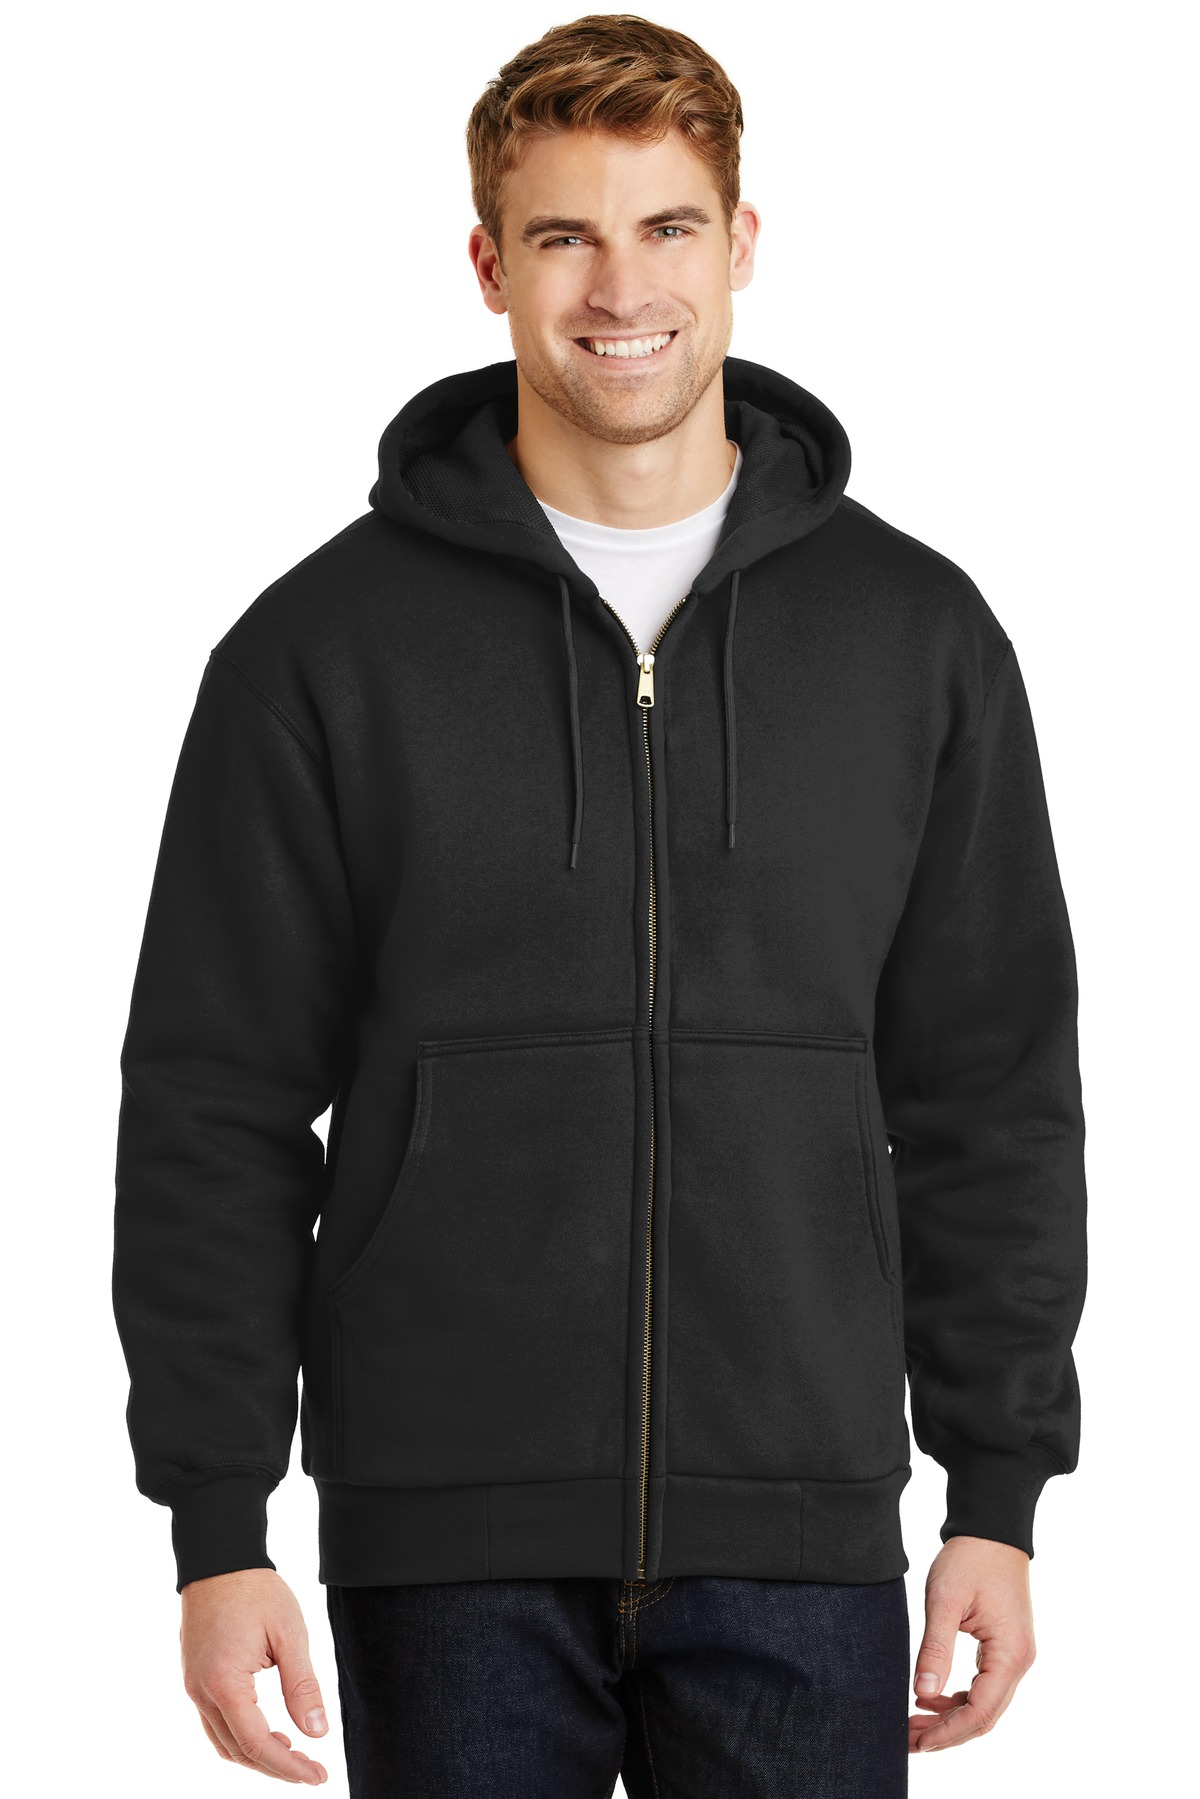 7ec2aeb3b Sweatshirts/Fleece - Apparel - Transfer Express